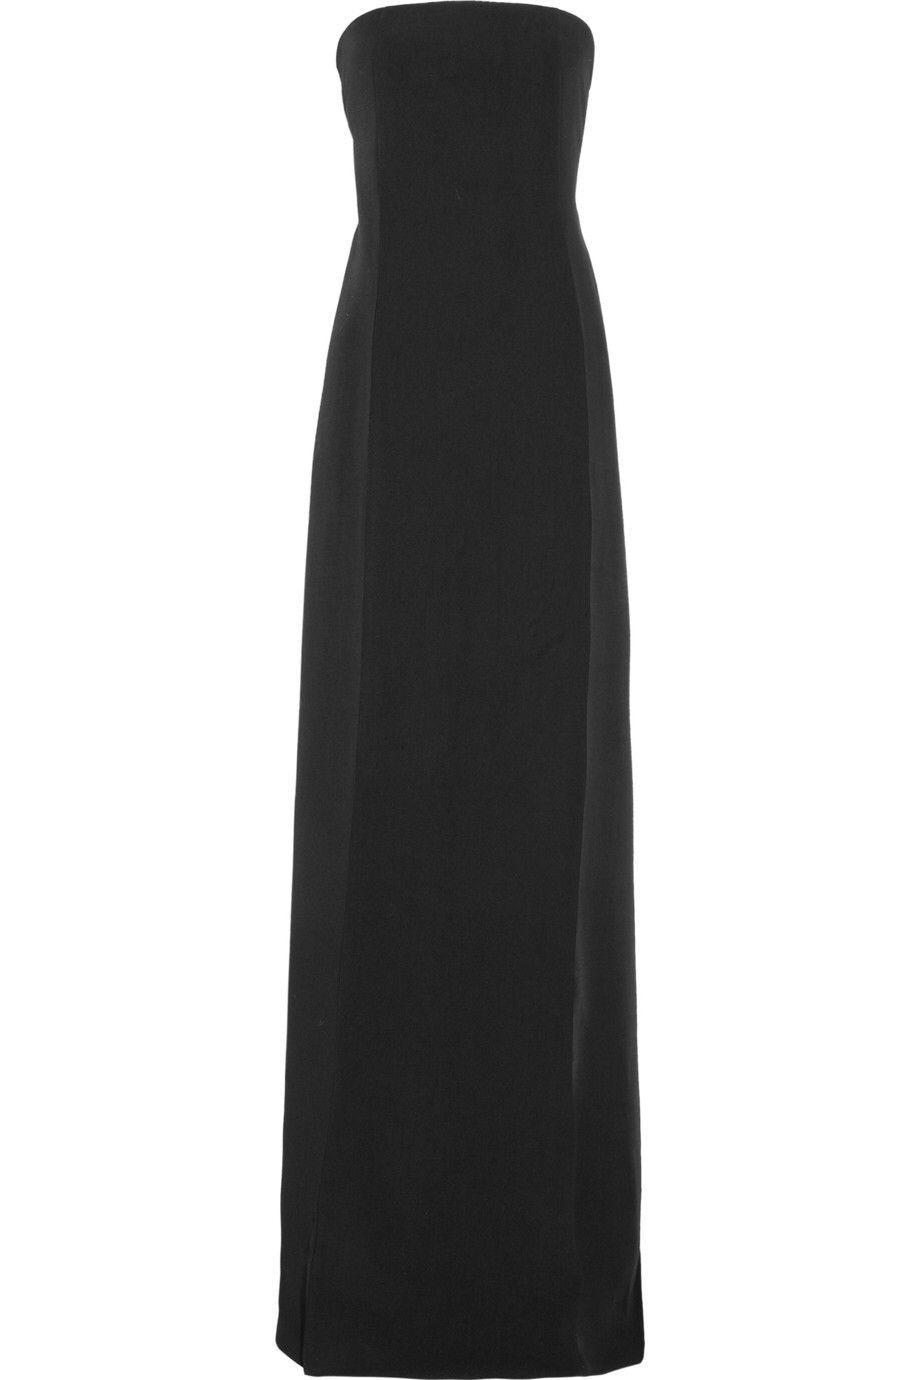 Calvin klein black maxi dress dresses pinterest calvin klein